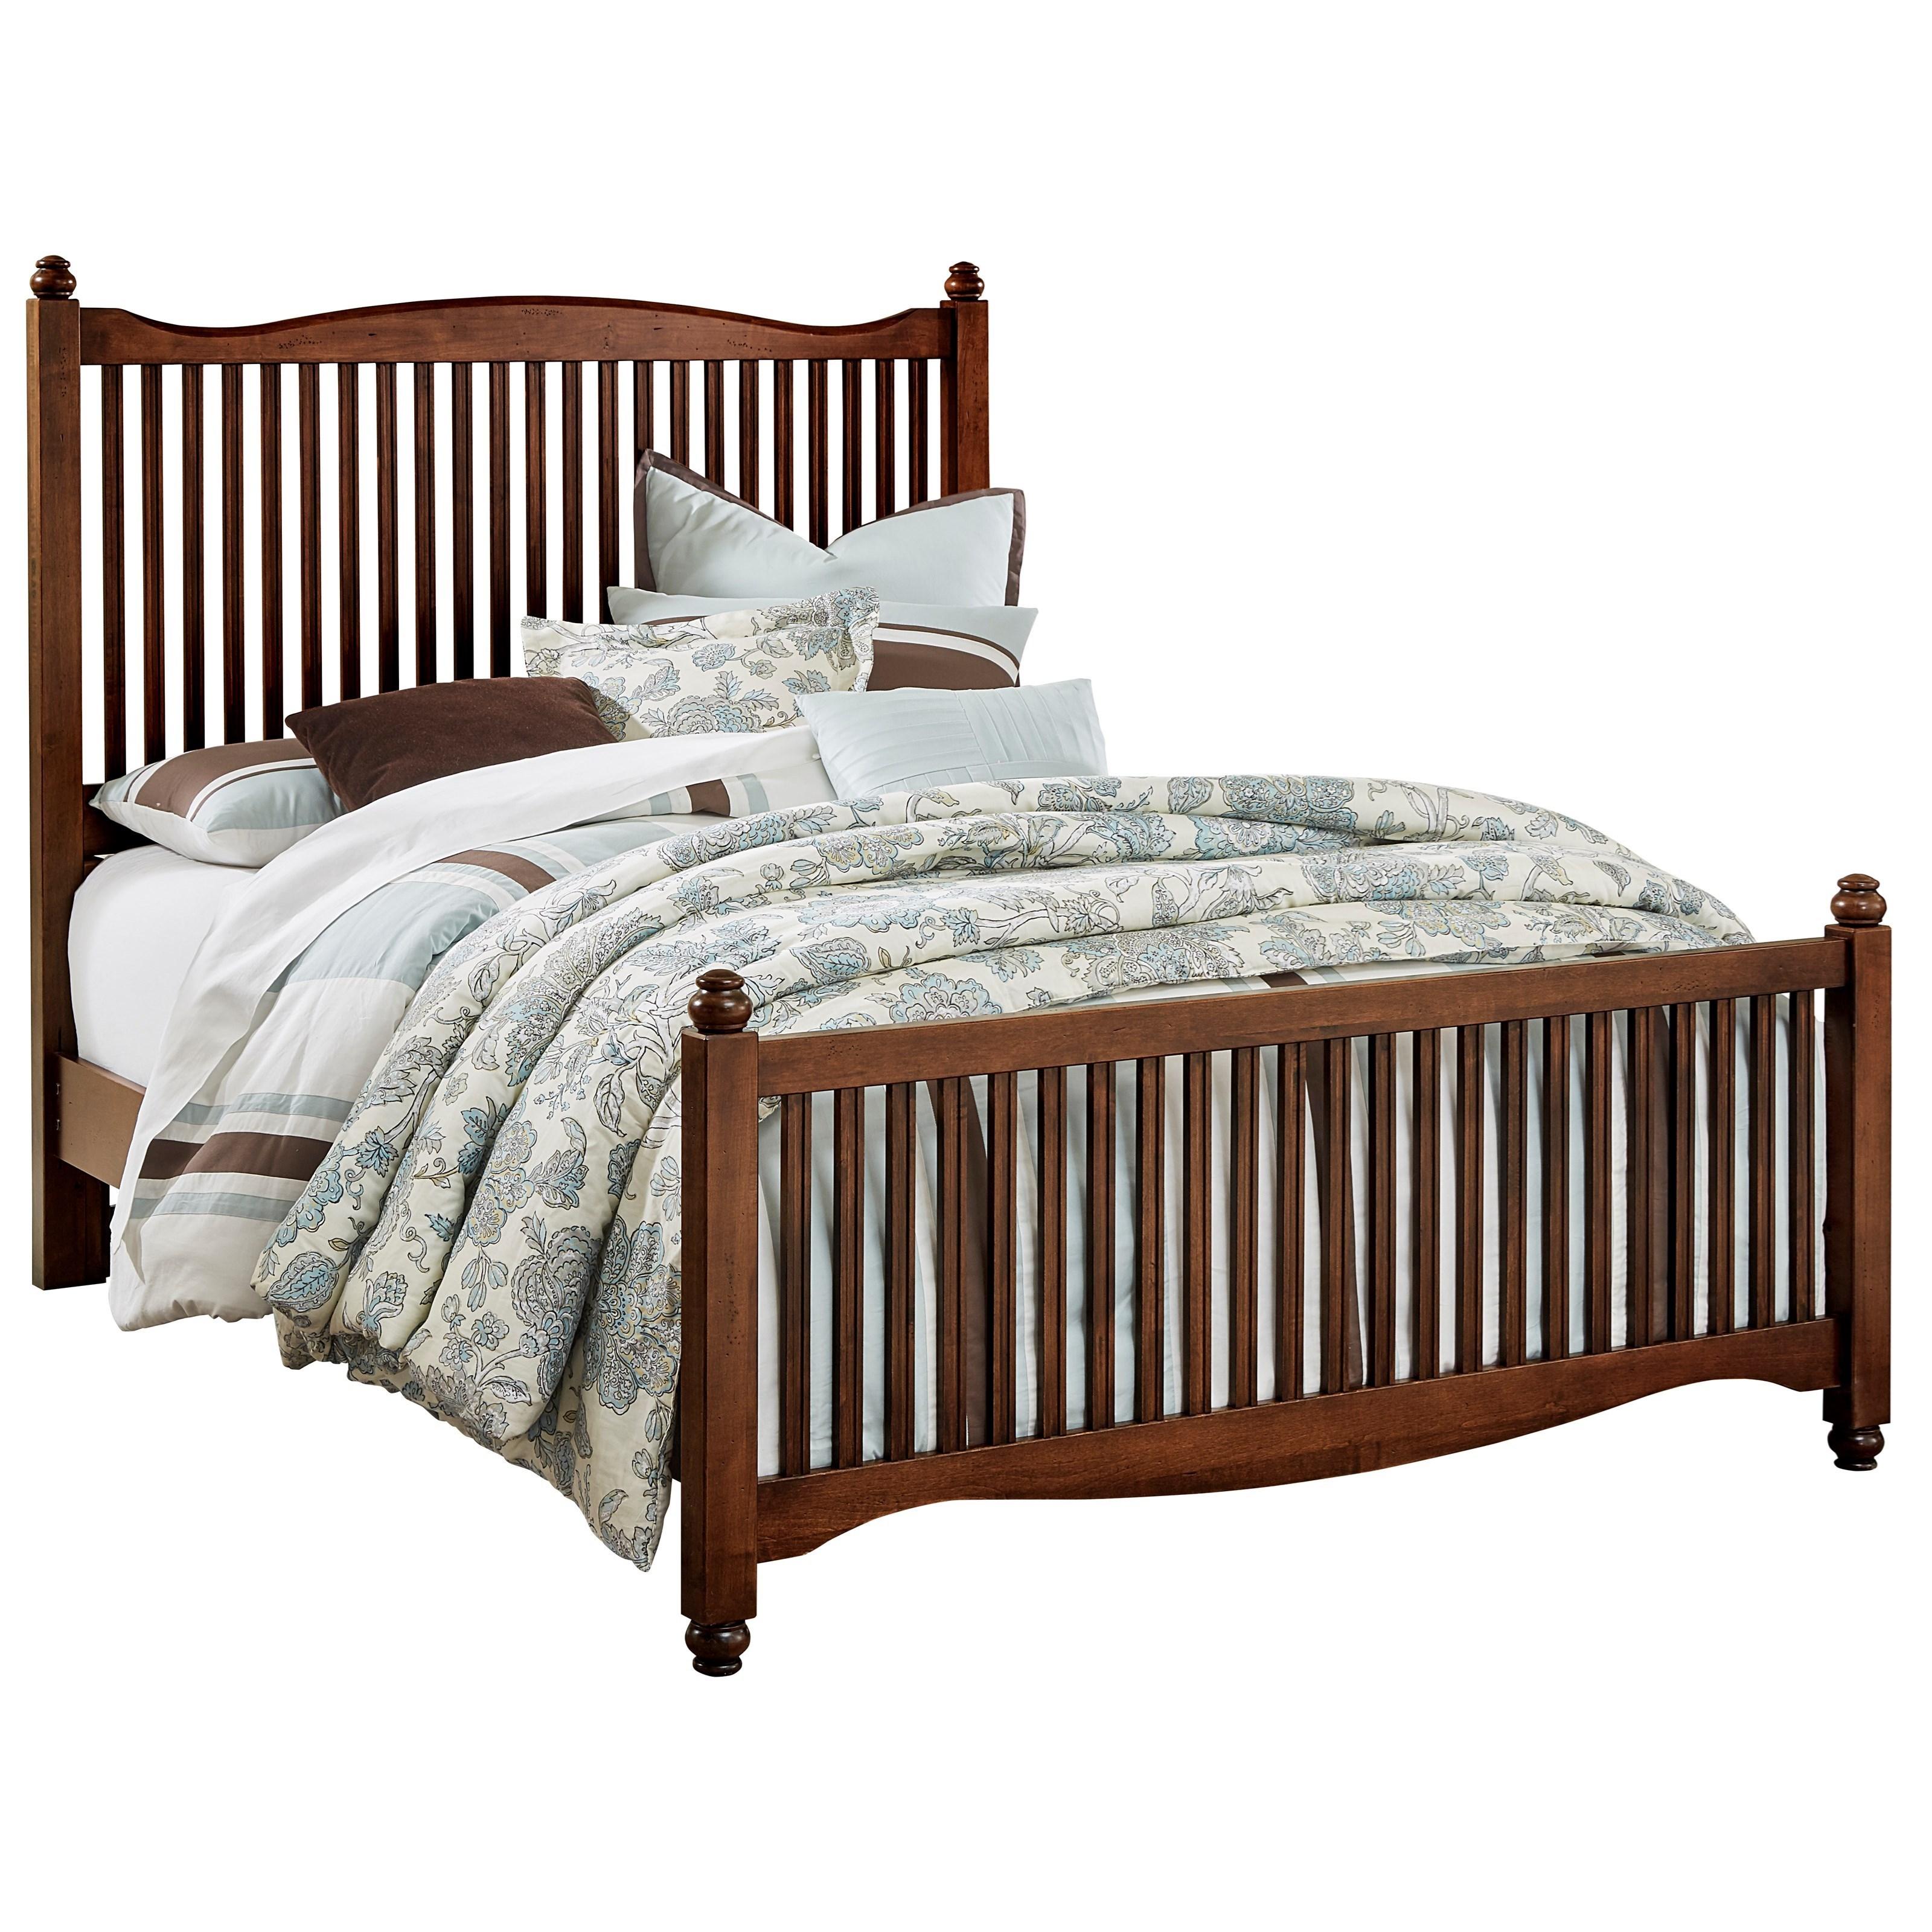 Vaughan Bassett American Maple Twin Slat Bed - Item Number: 400-377+773+900